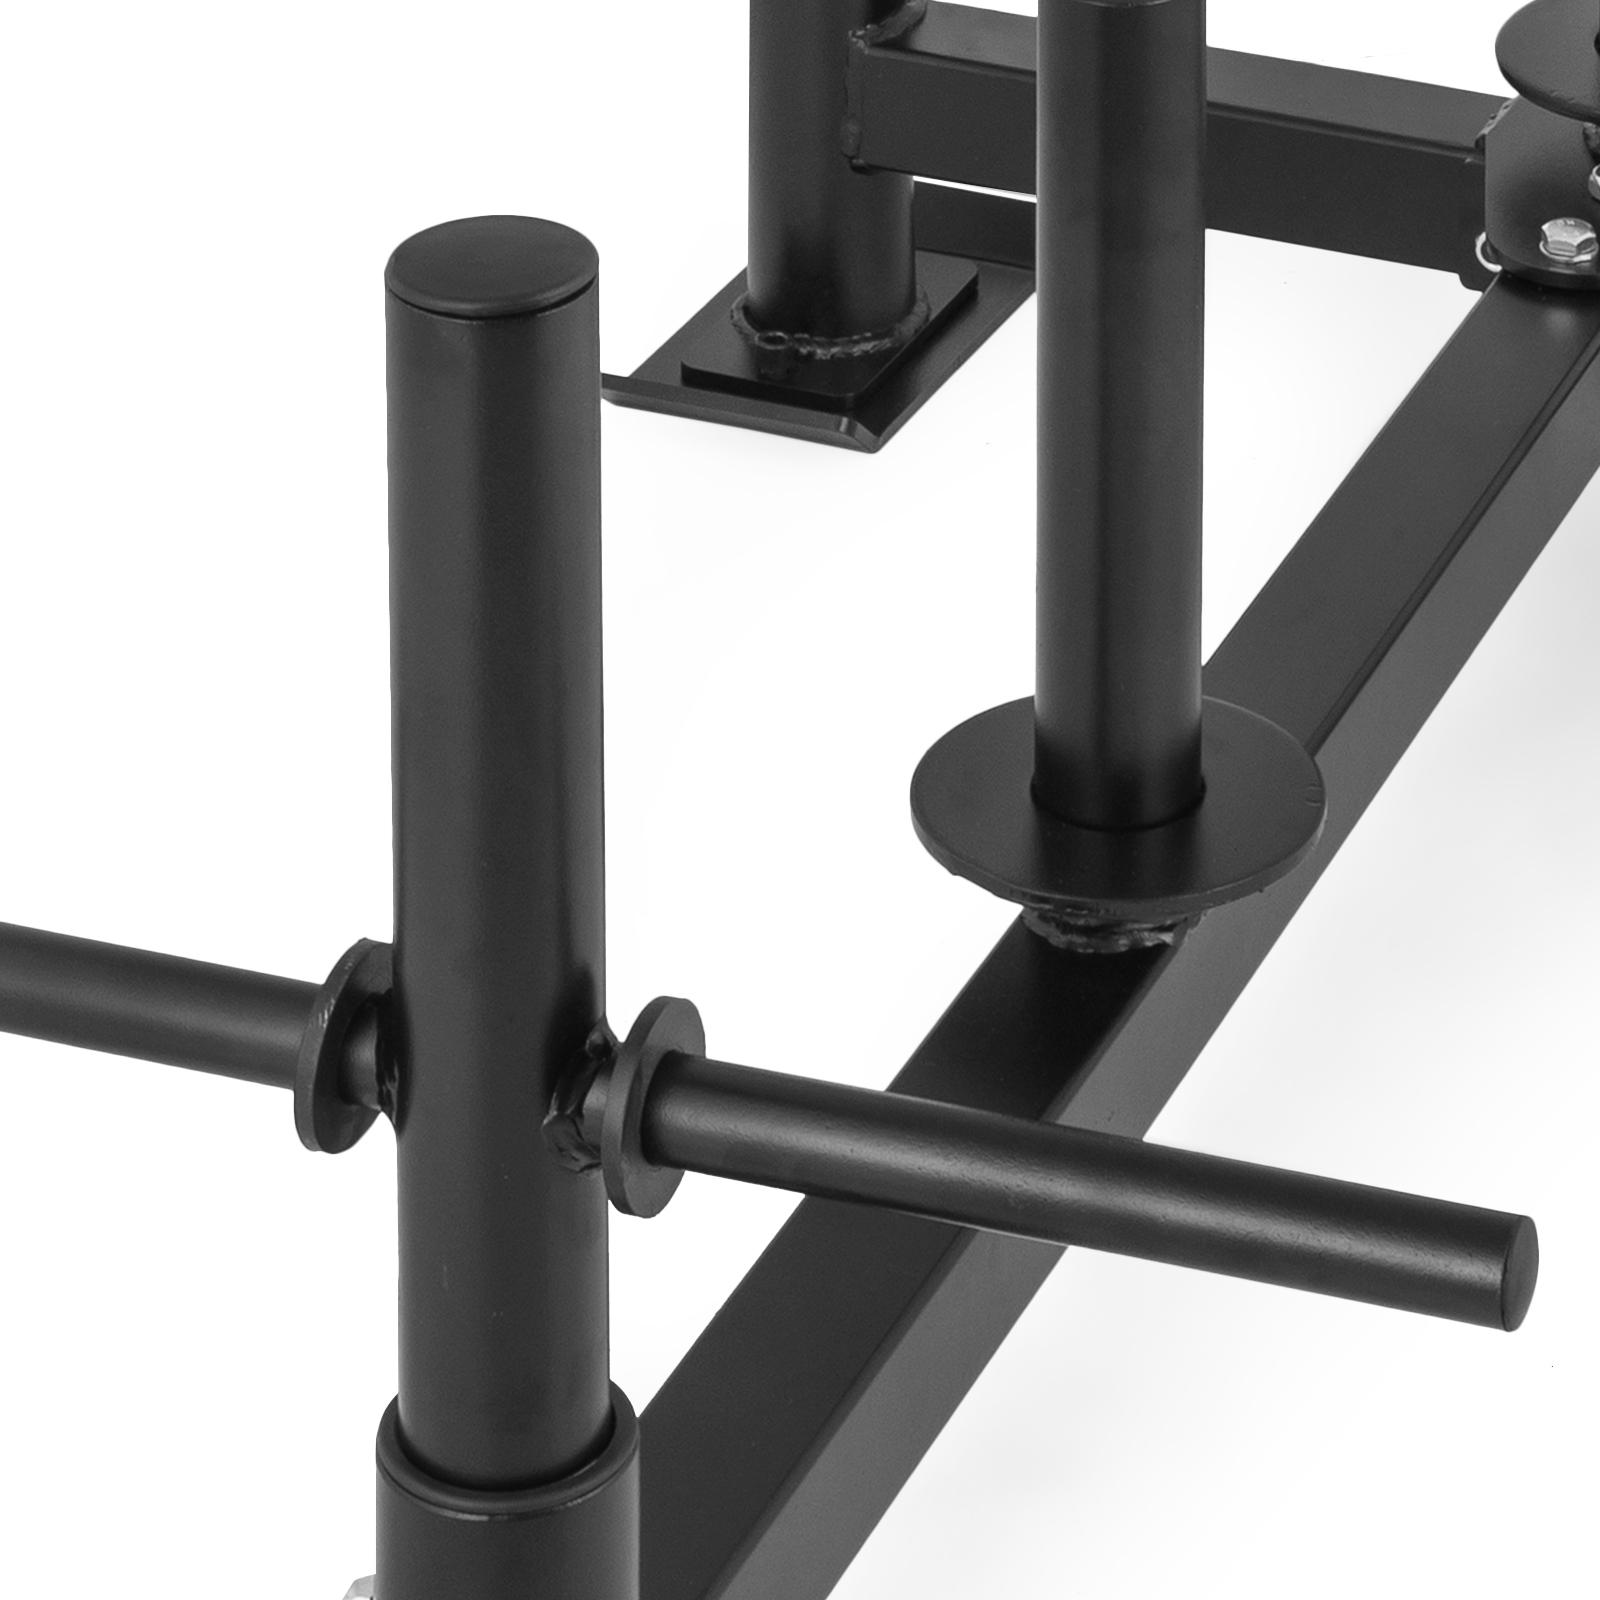 Fitness-HD-Weight-Sled-Low-Push-Pull-High-Training-Training-Fitness-Plates miniatura 10